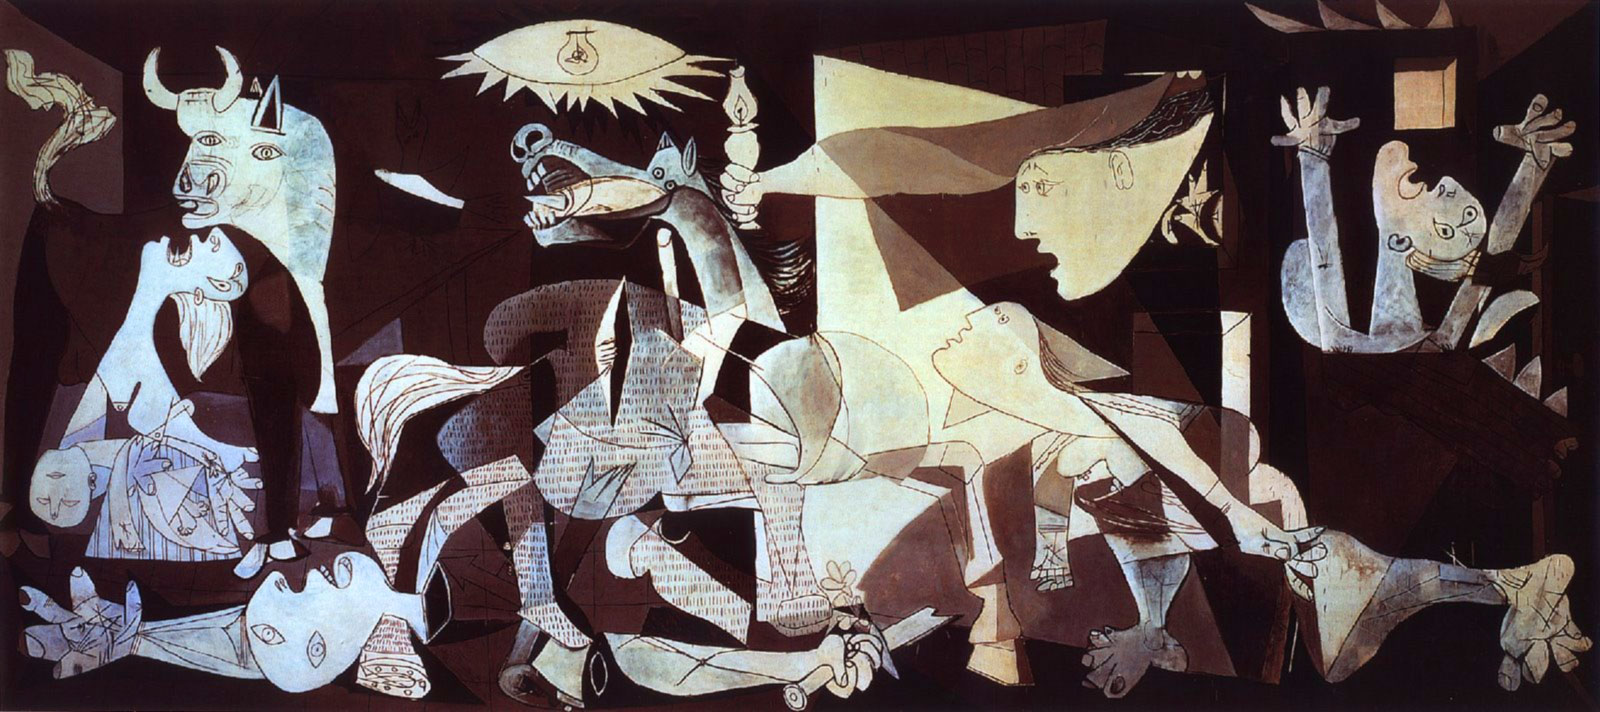 Exhibiotn of Pablo Picasso in Sorrento